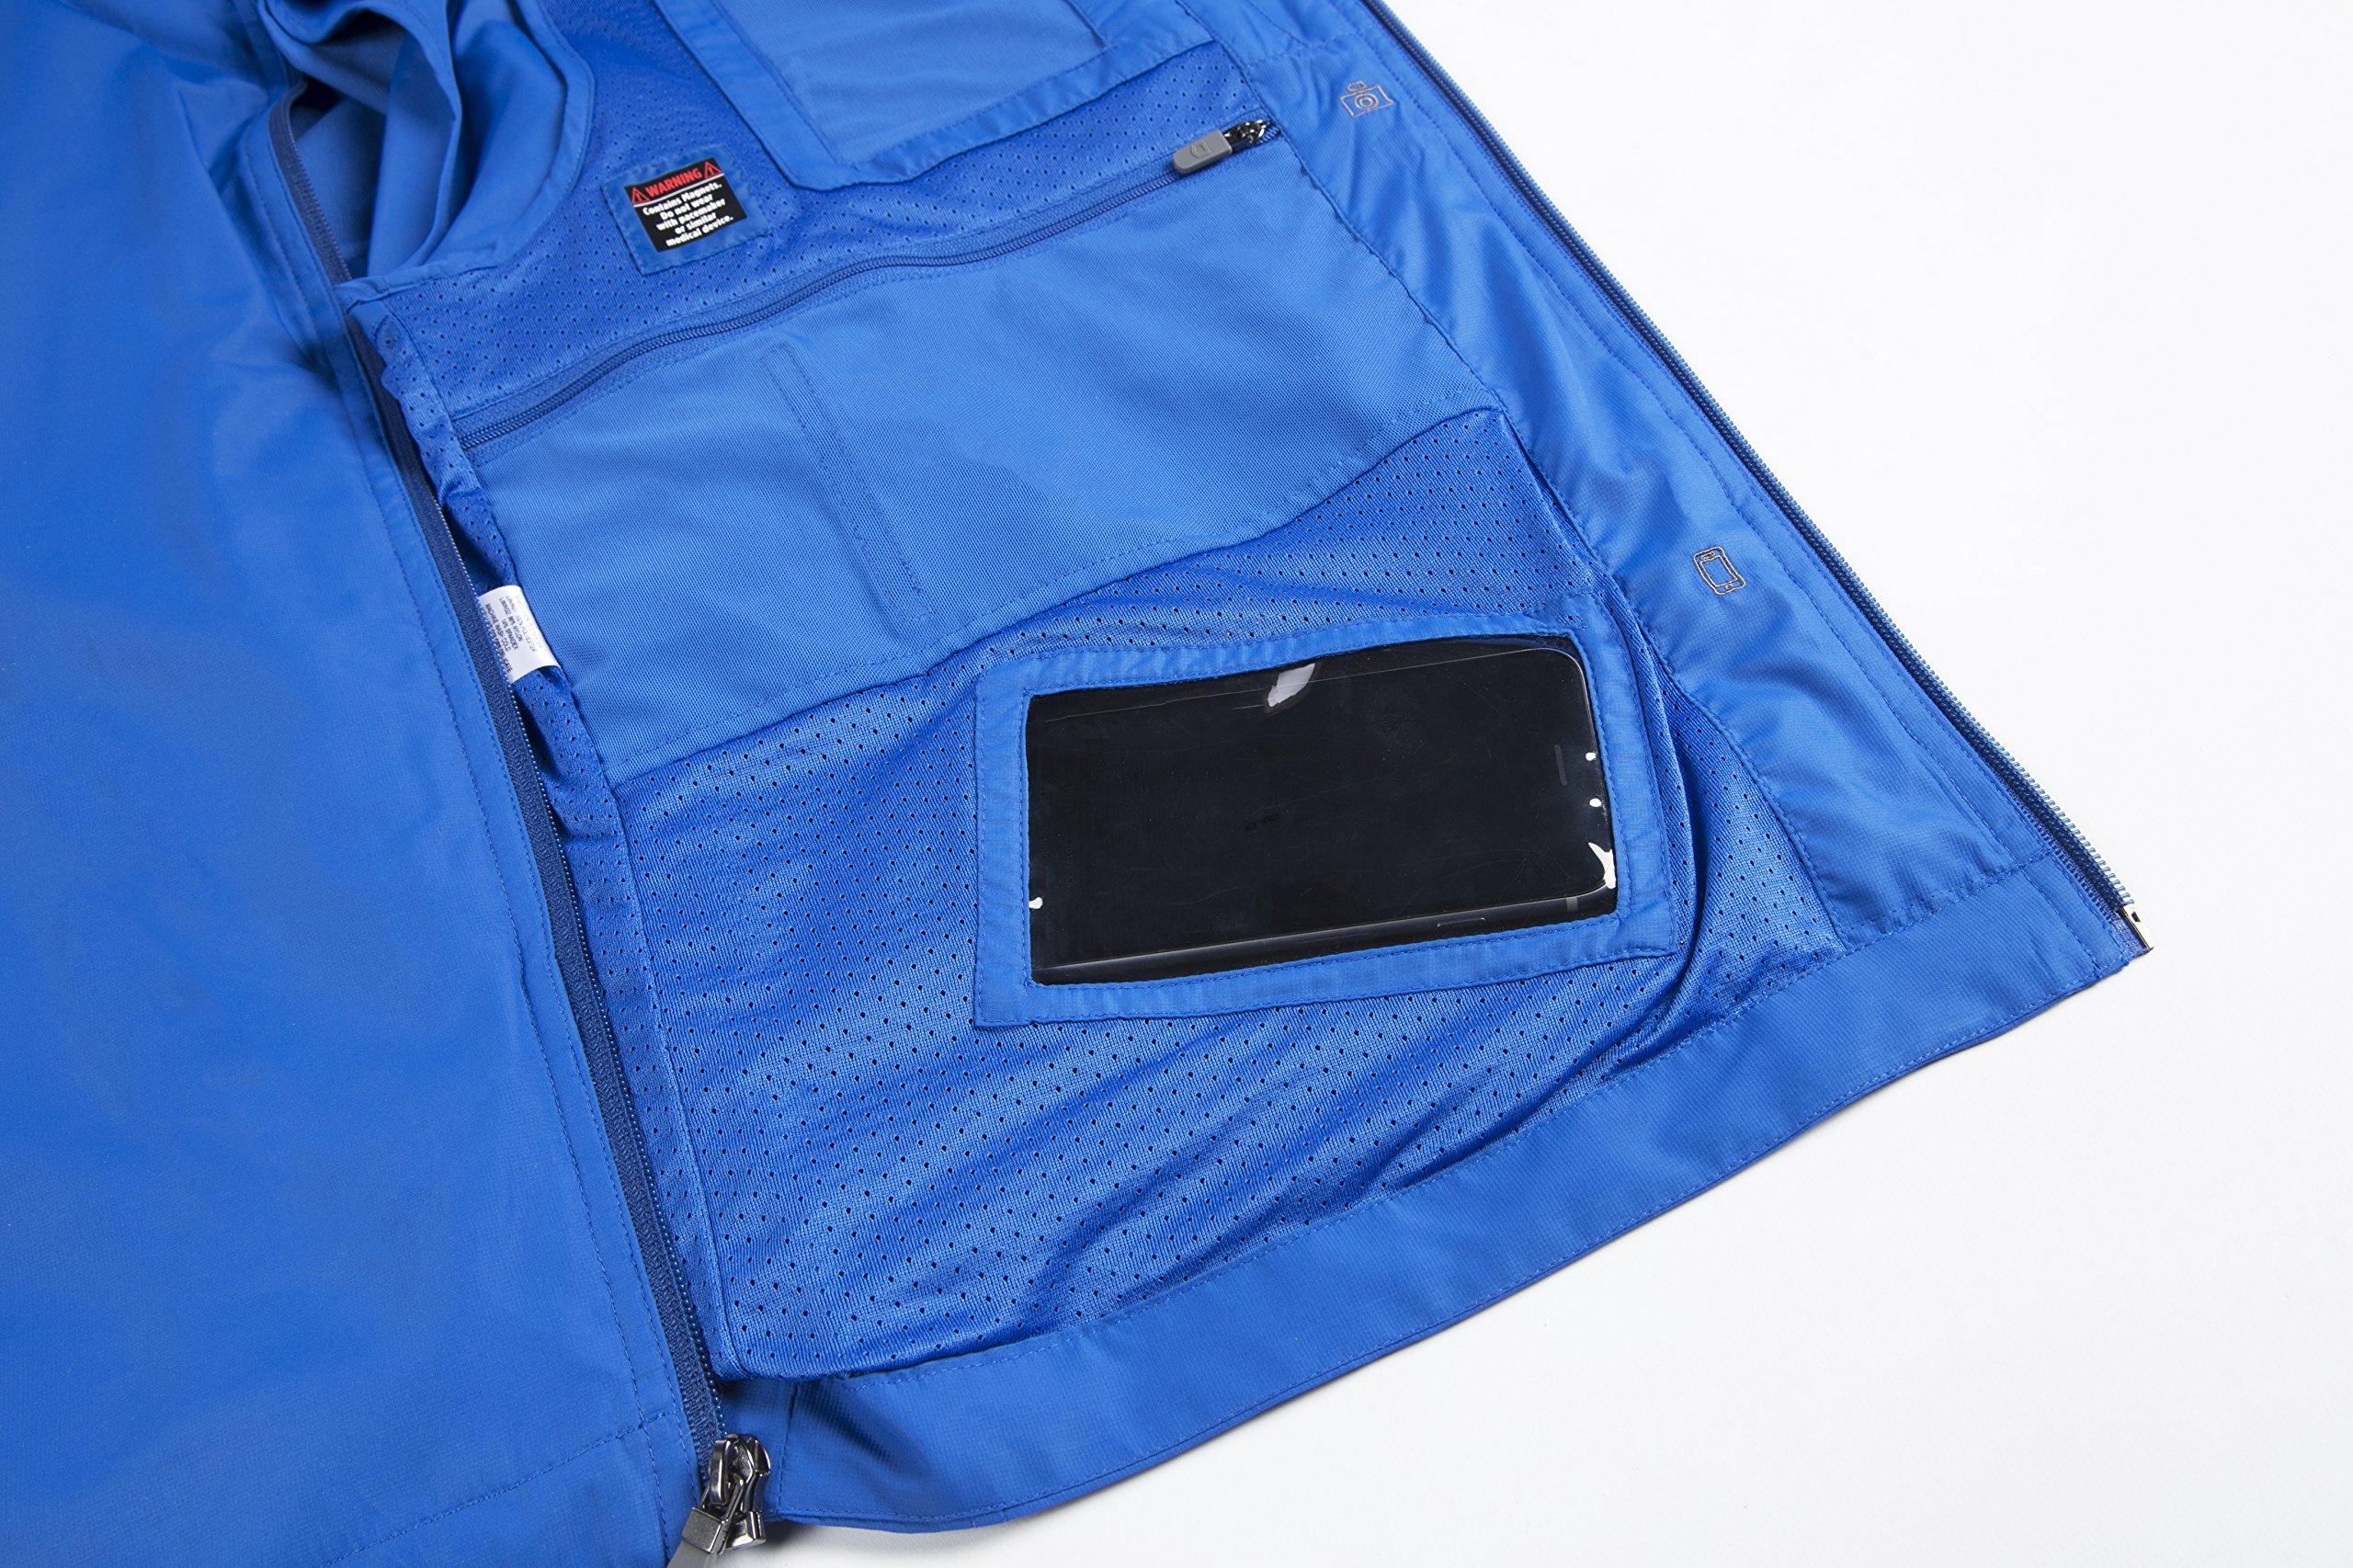 SCOTTeVEST Tropiformer Jacket - 22 Pockets – Convertible, Travel Clothing RED L by SCOTTeVEST (Image #5)